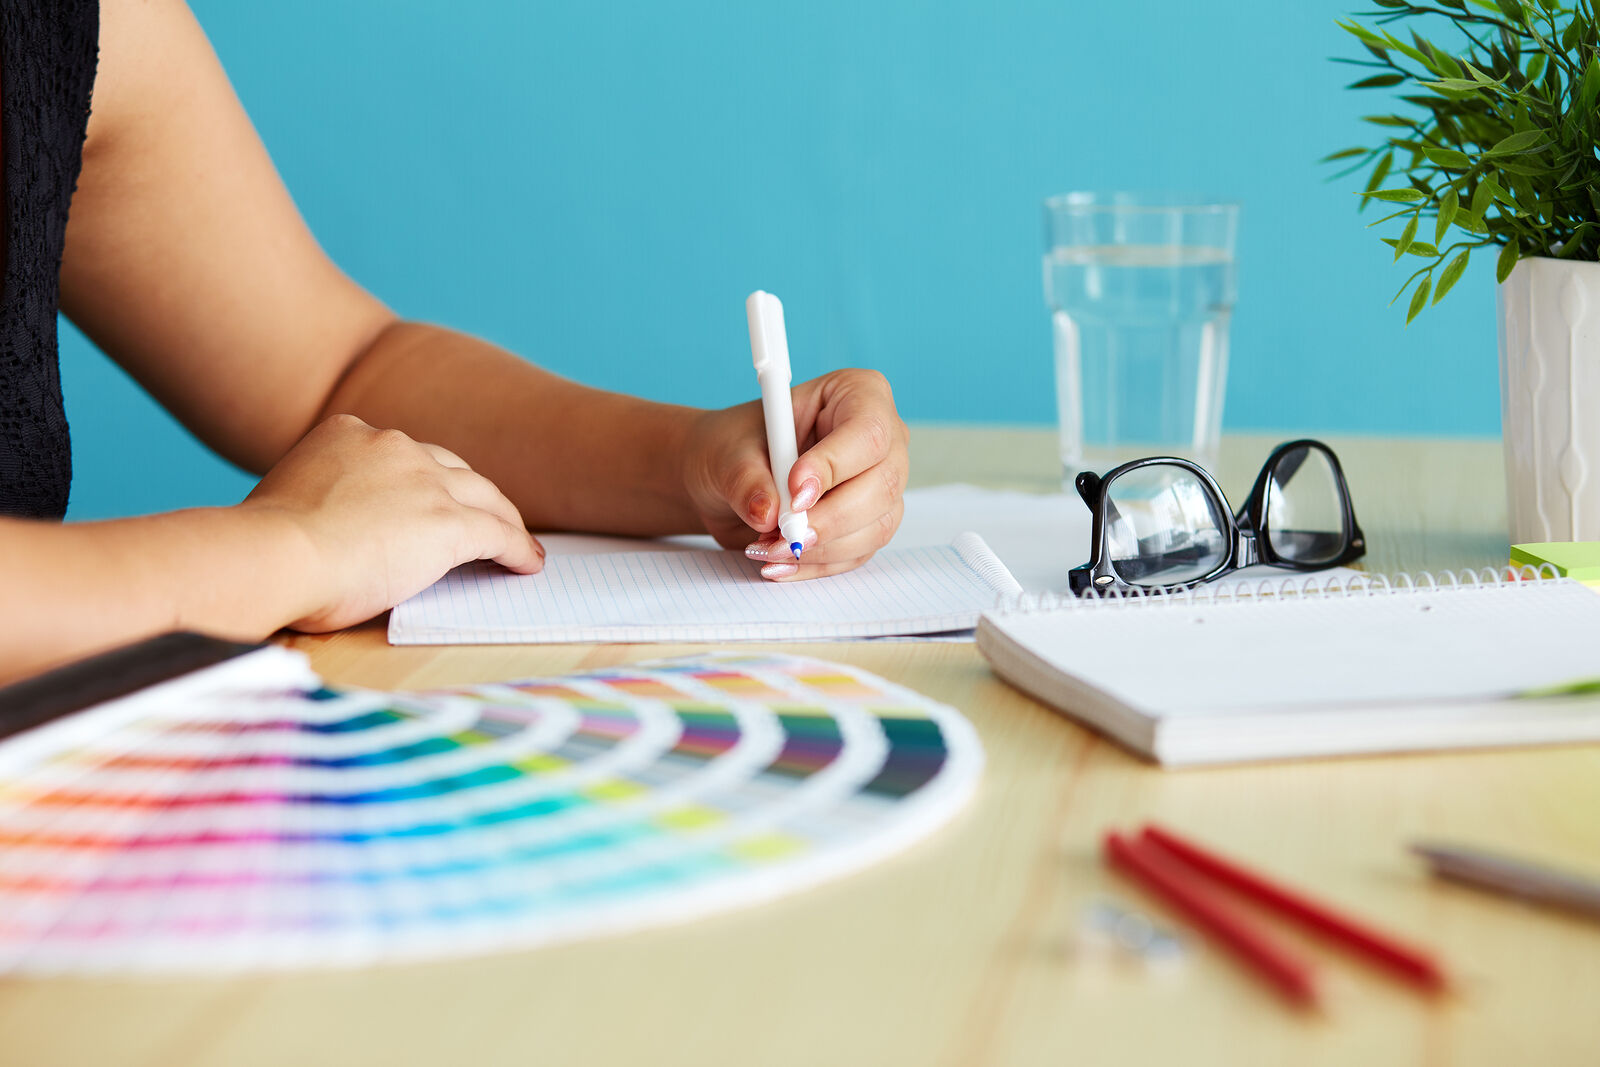 Graphic designer at sketching the web design